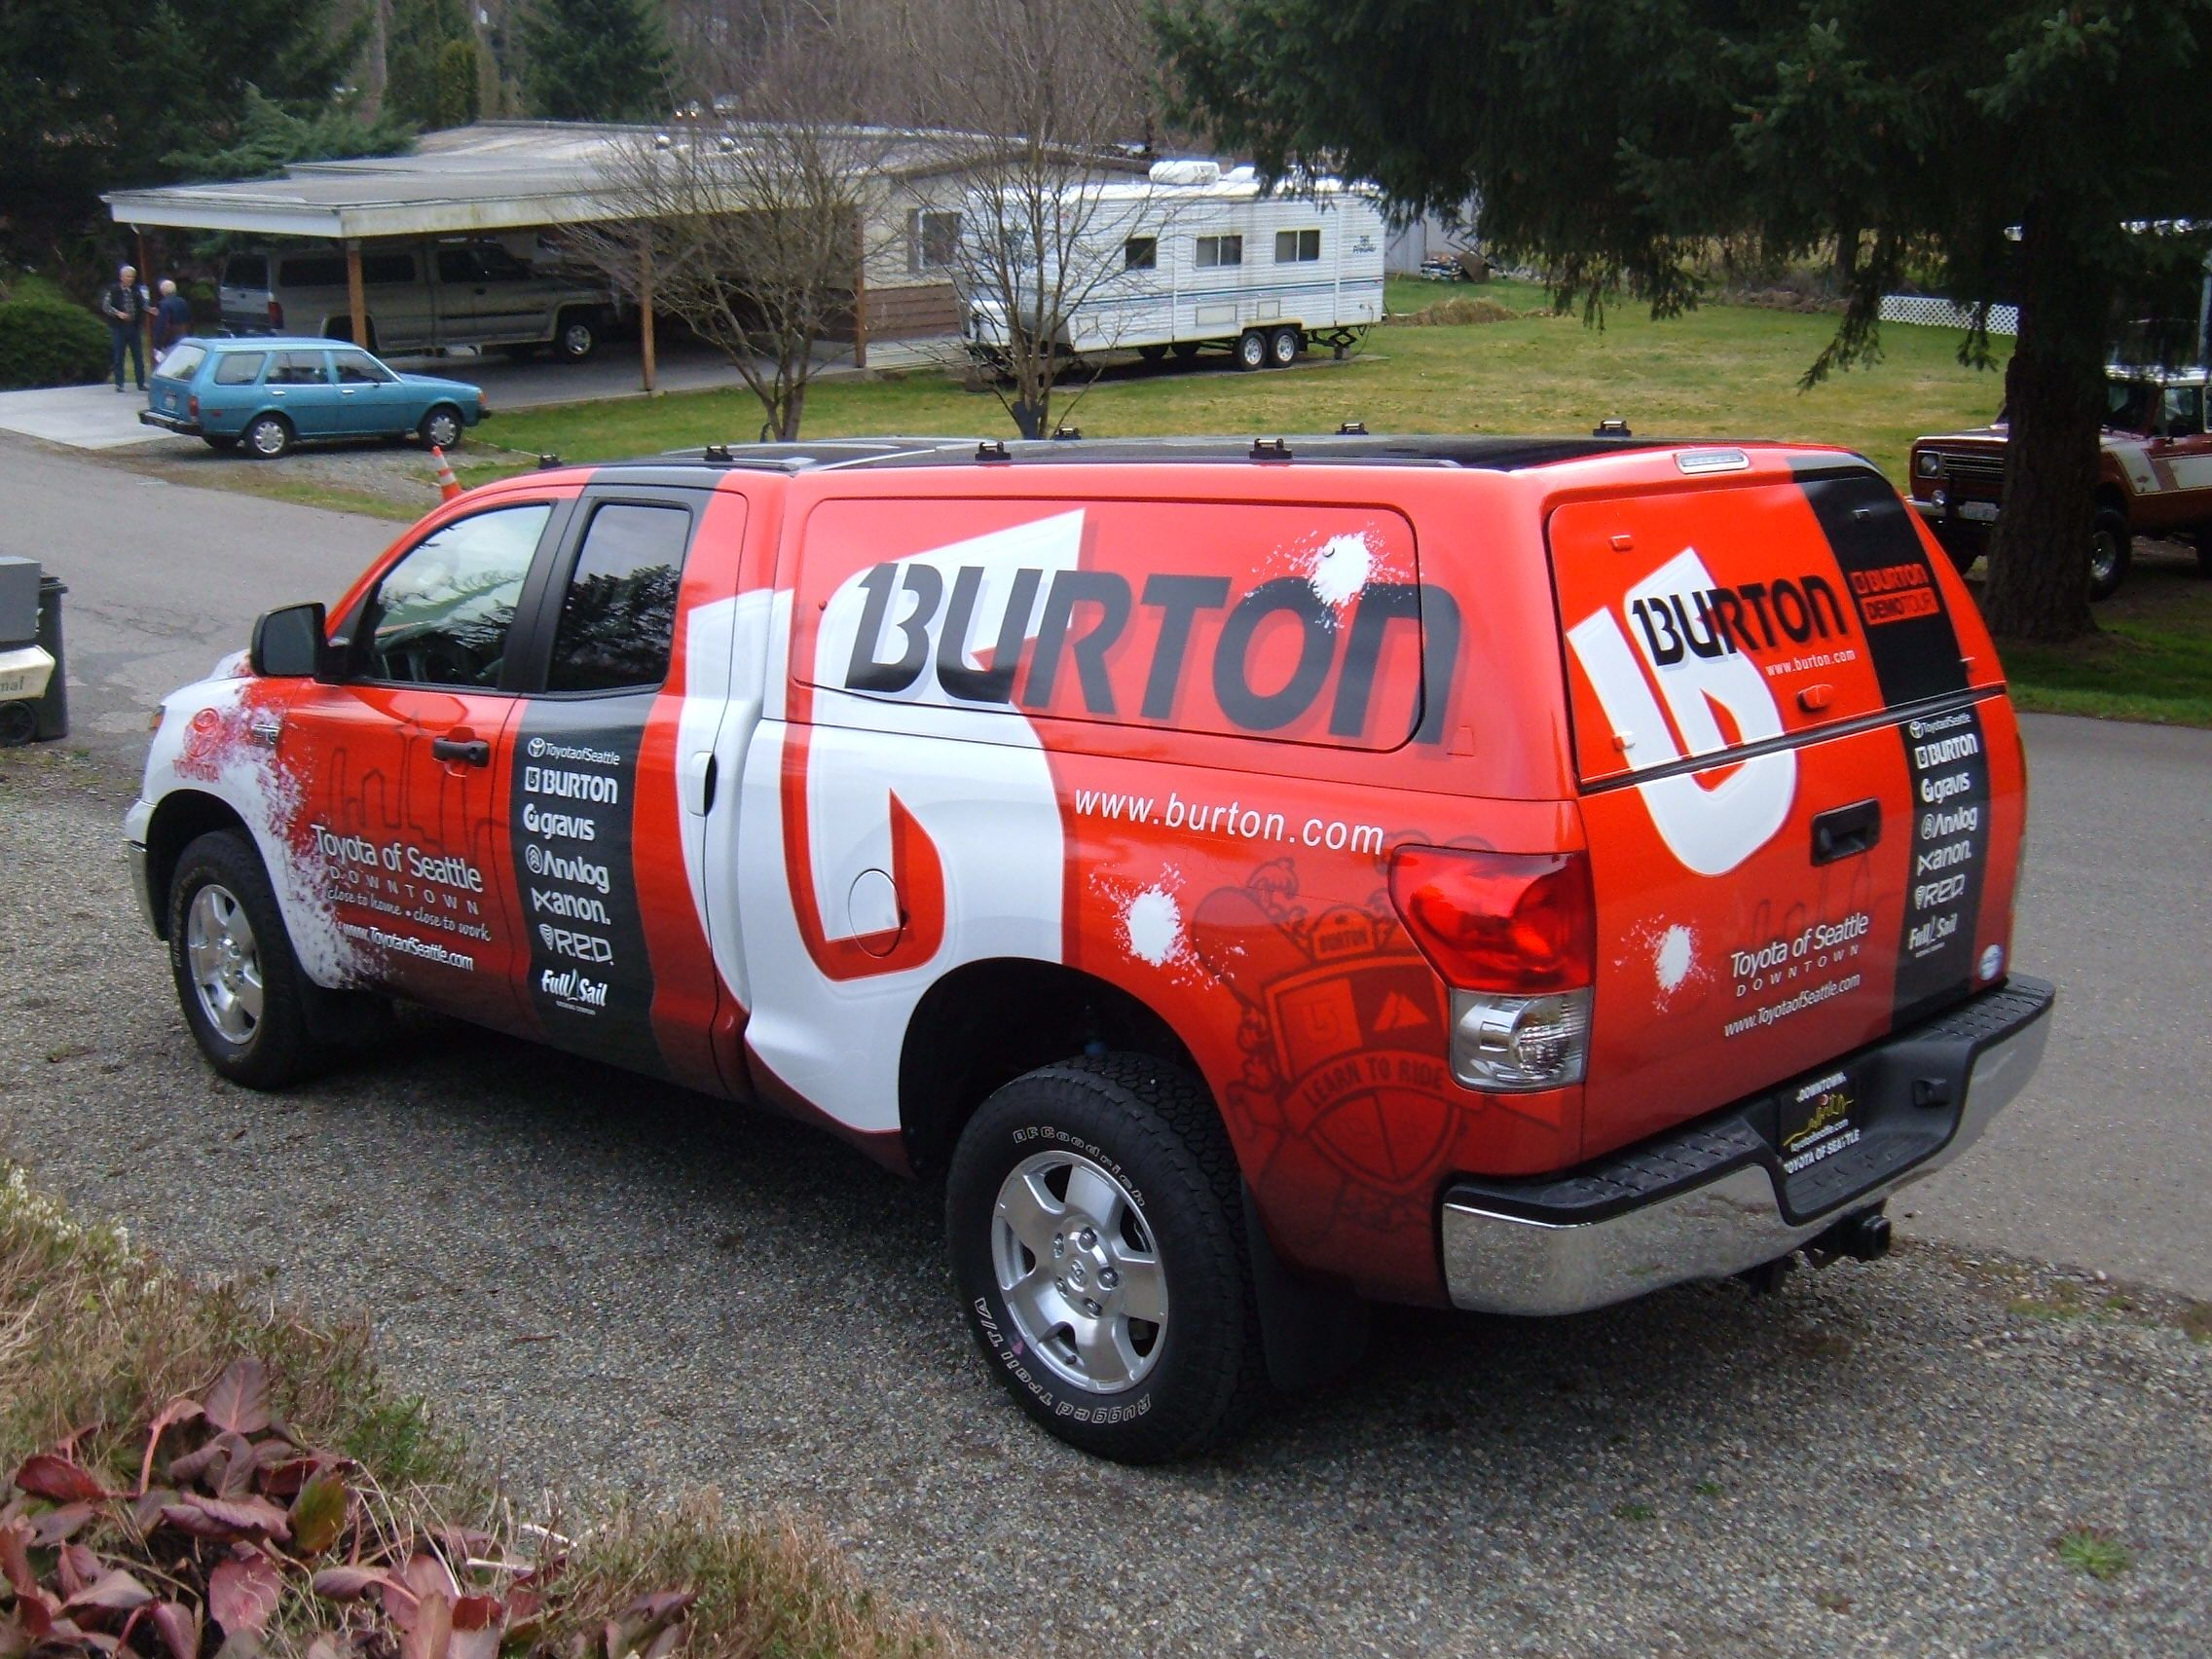 Burton Snowboard Truck Google Search Action Sport Trucks And